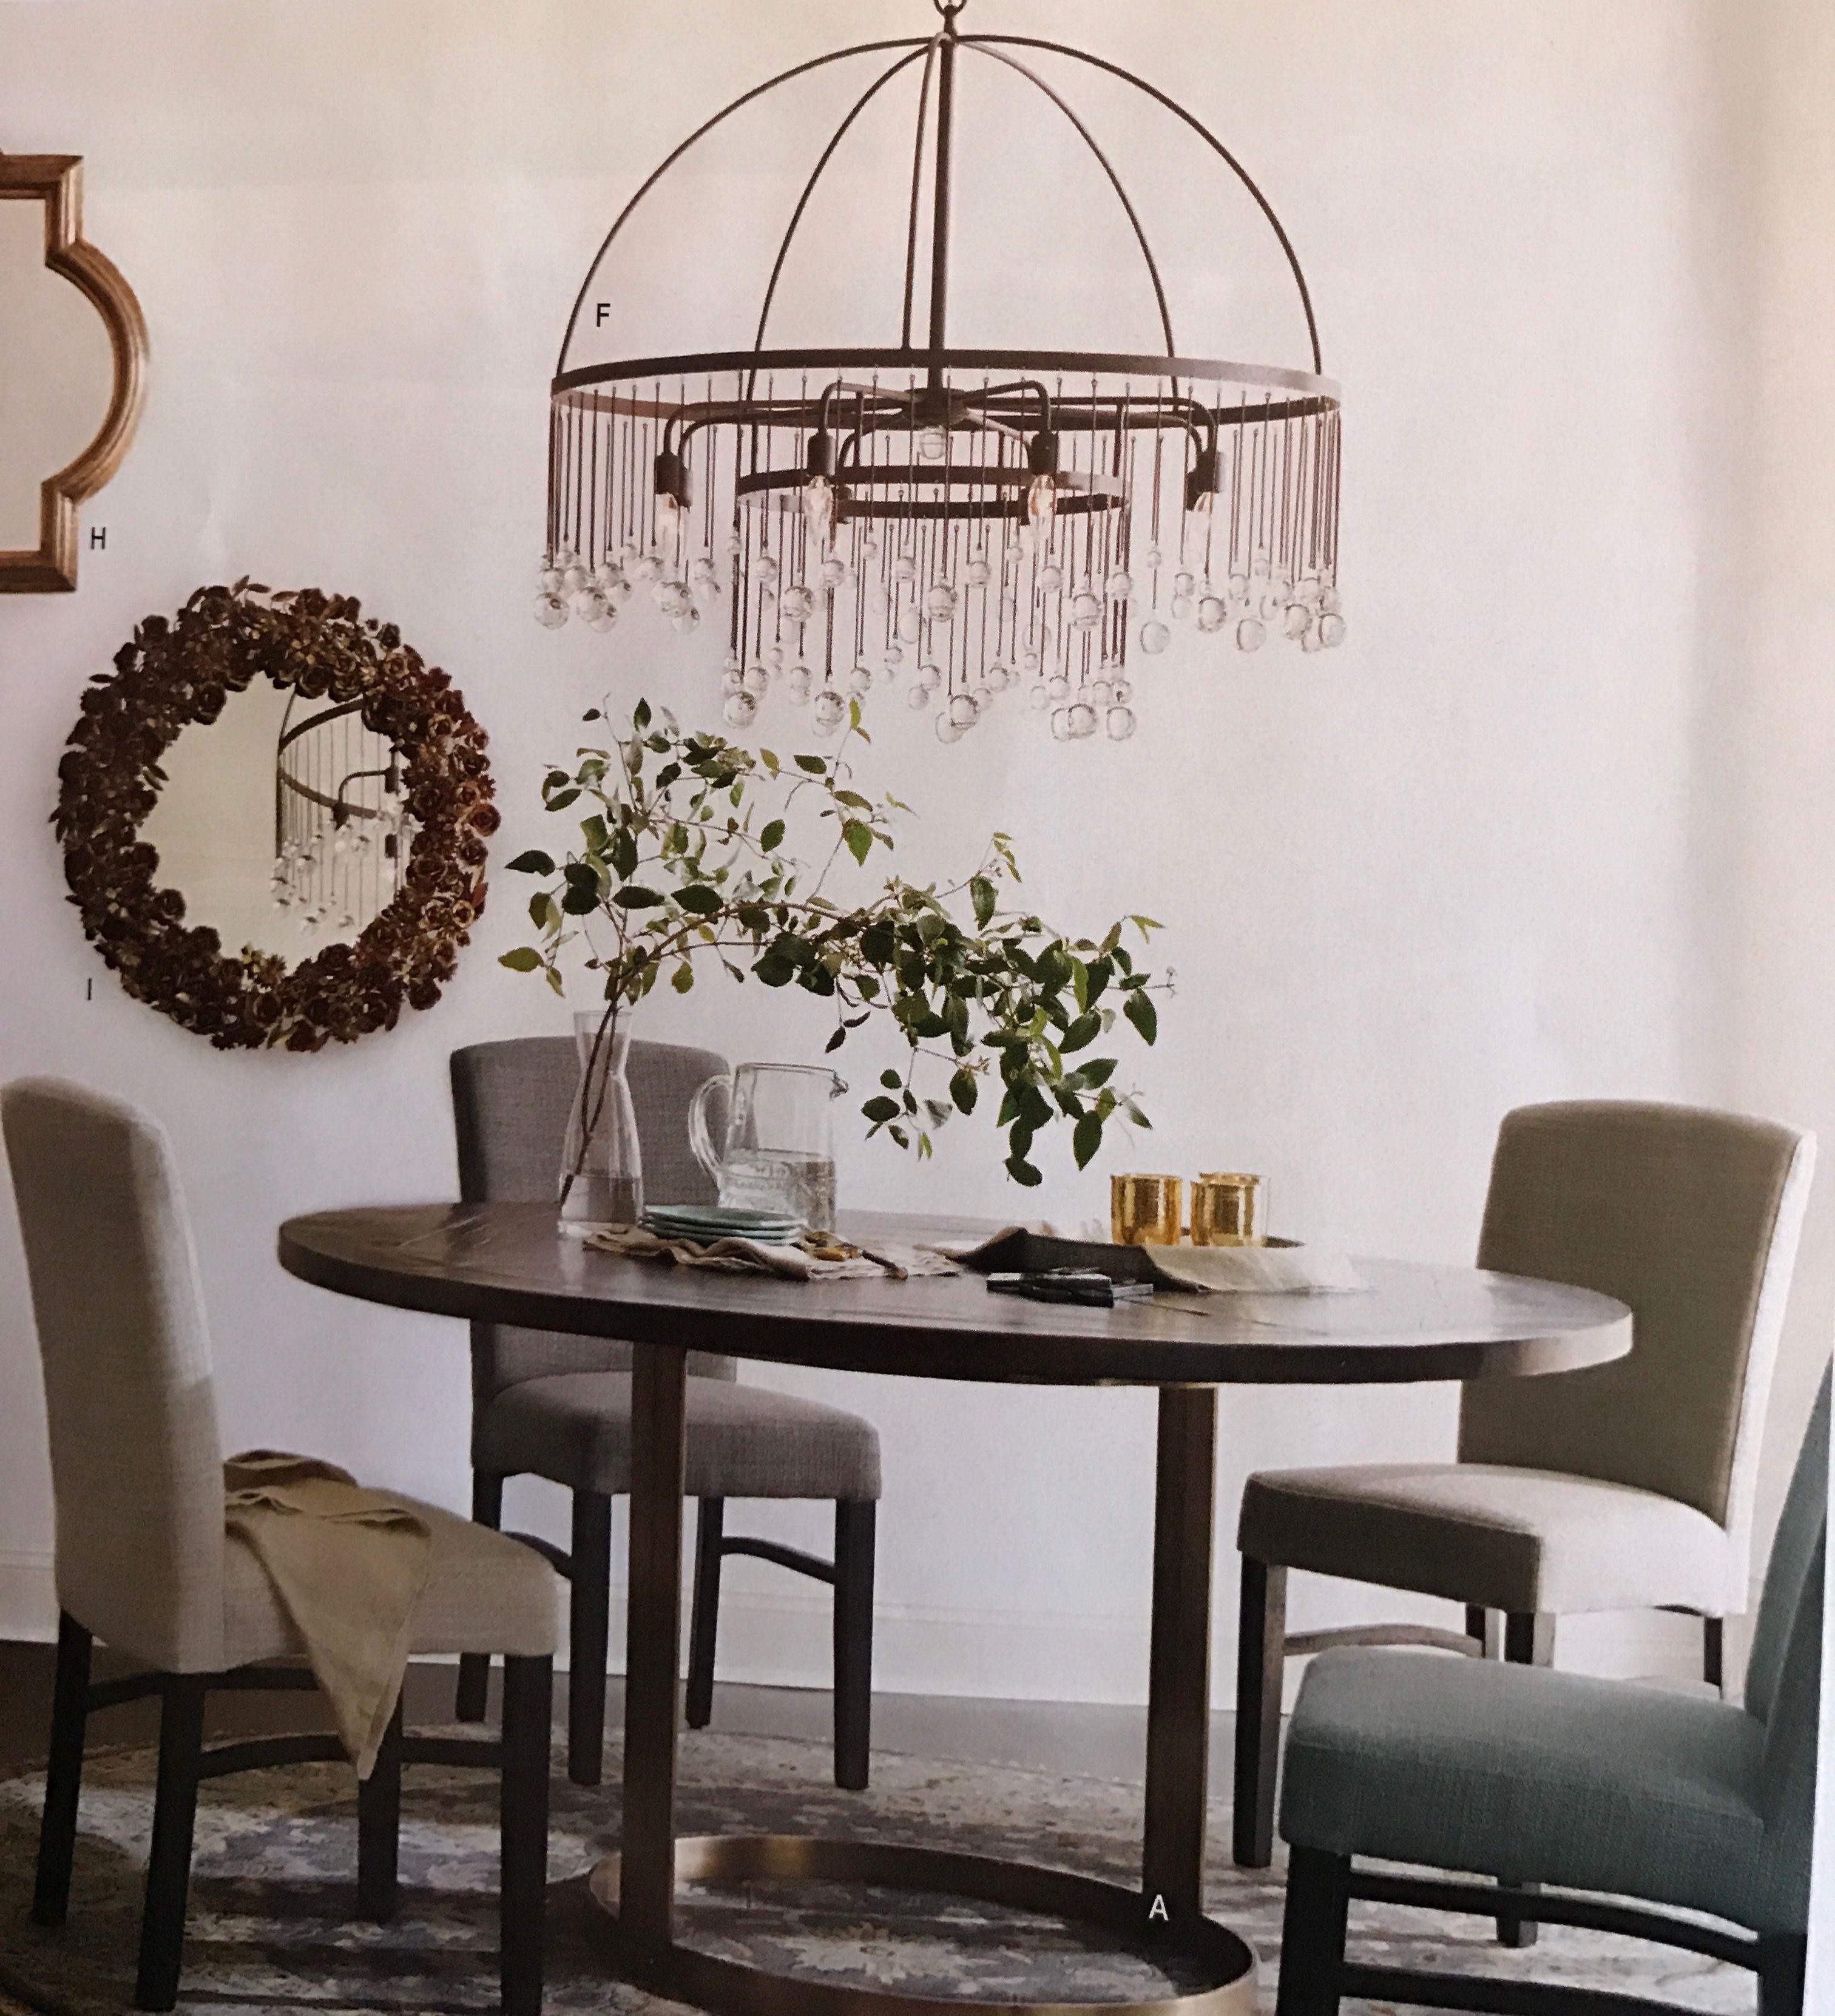 From Arhaus Aubrey eight light chandelier 36 inches in diameter